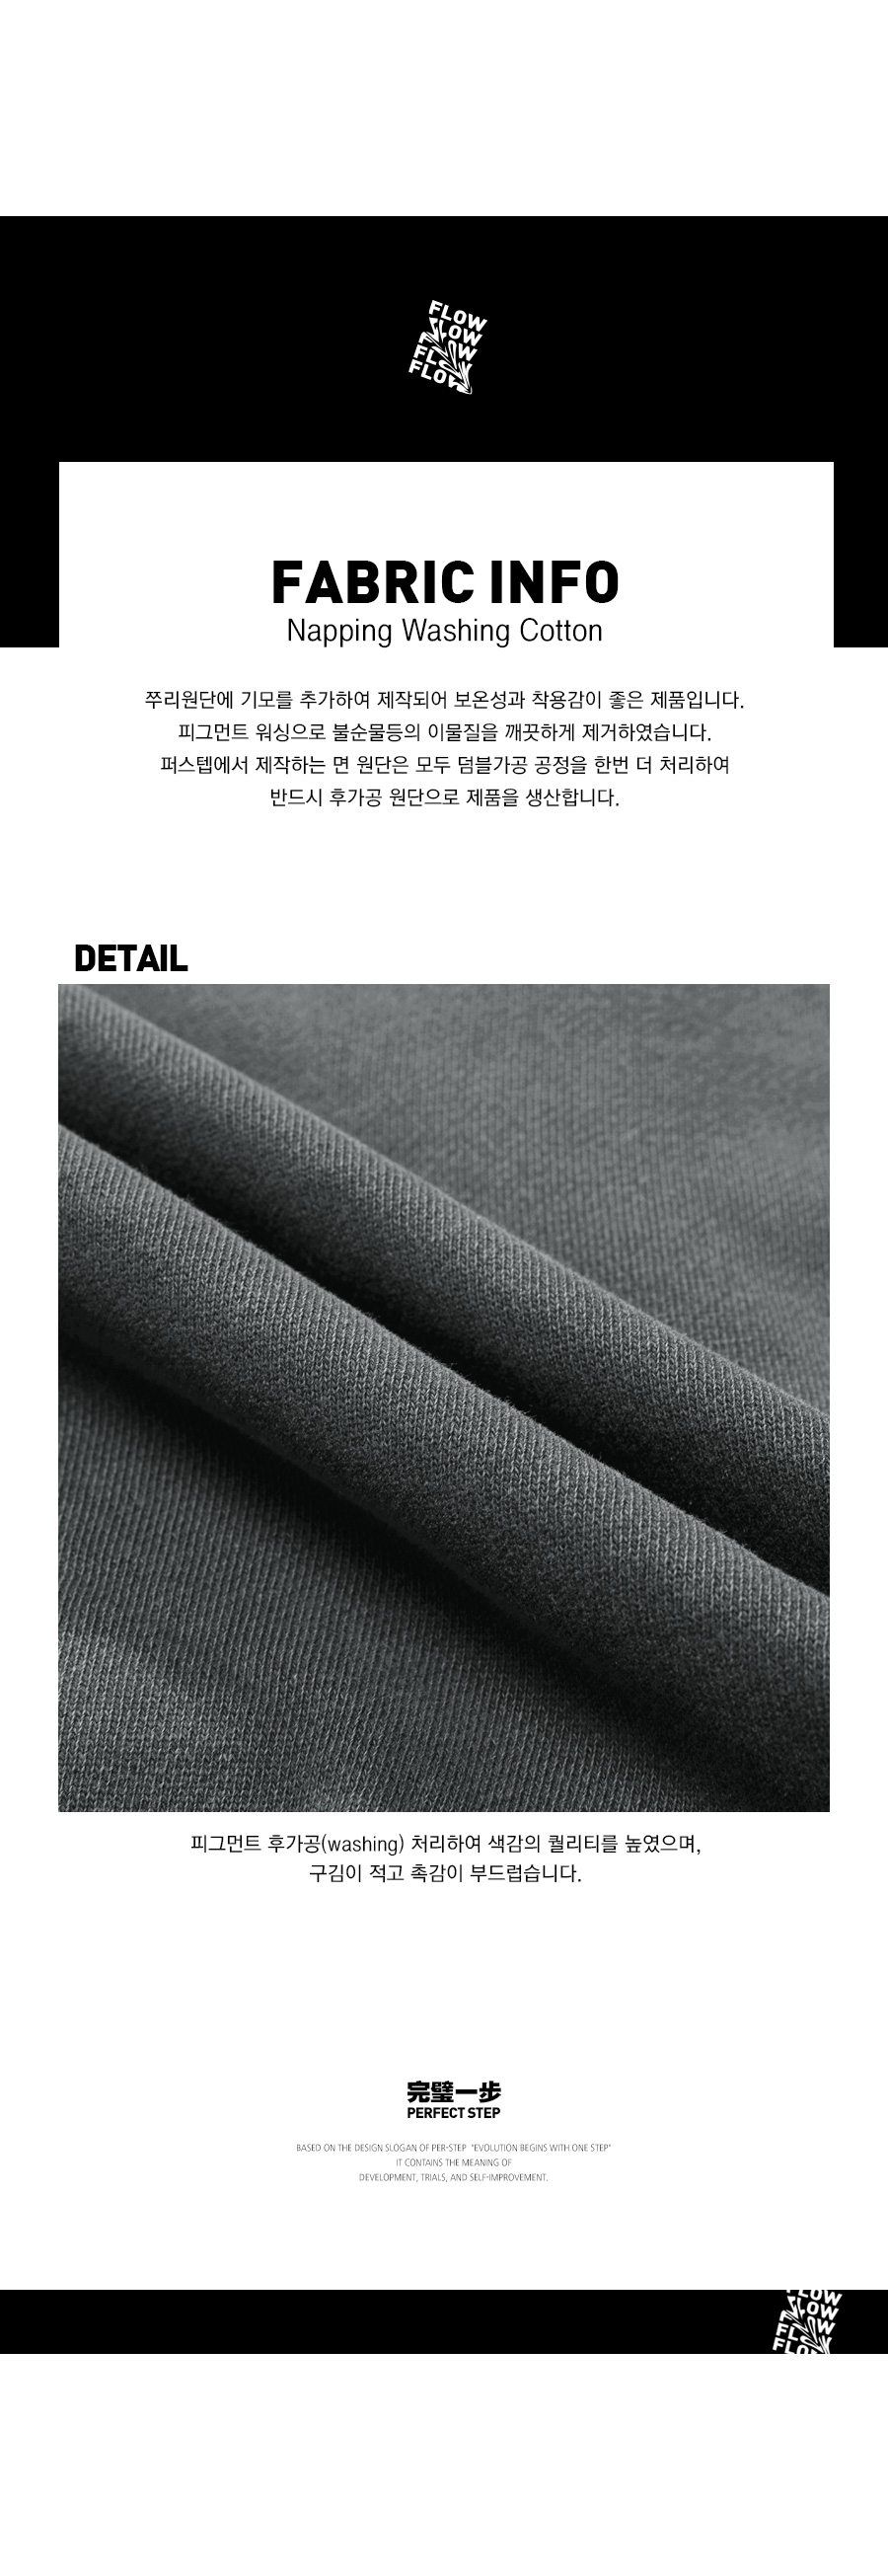 4299_detail_bj.jpg